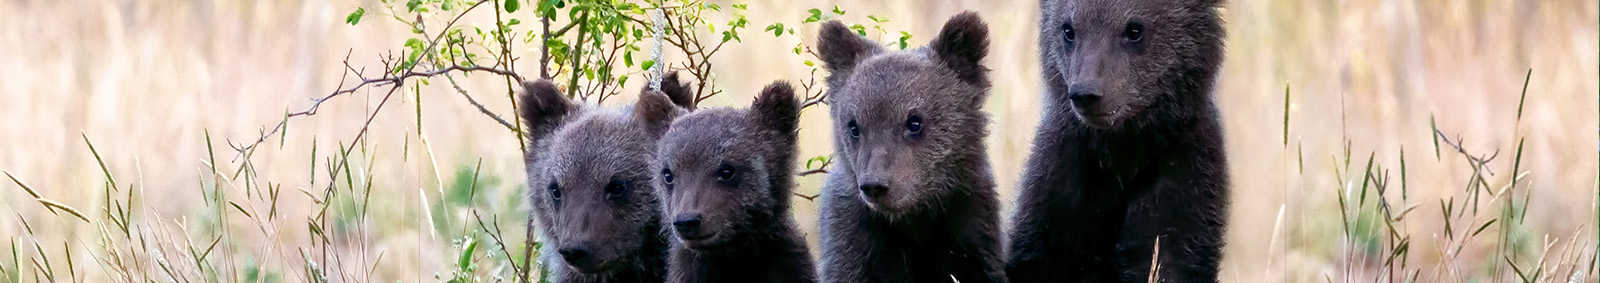 Marsican Bear Cub, Italy